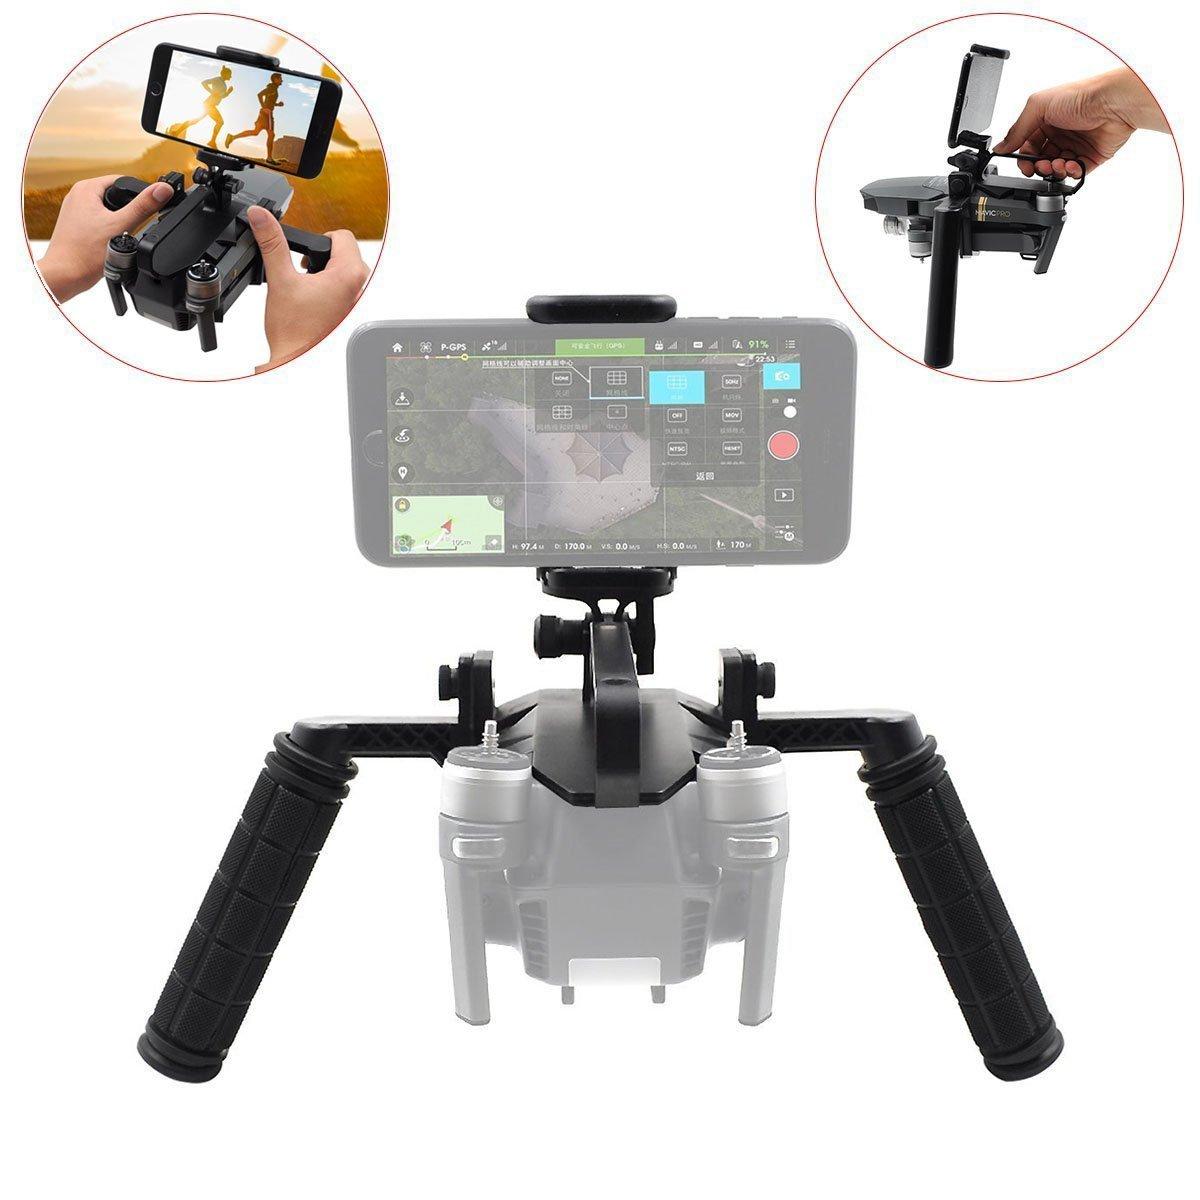 Cinema Tray for DJI Mavic Pro Handheld Gimbal Camera Stabilizer STARTRC